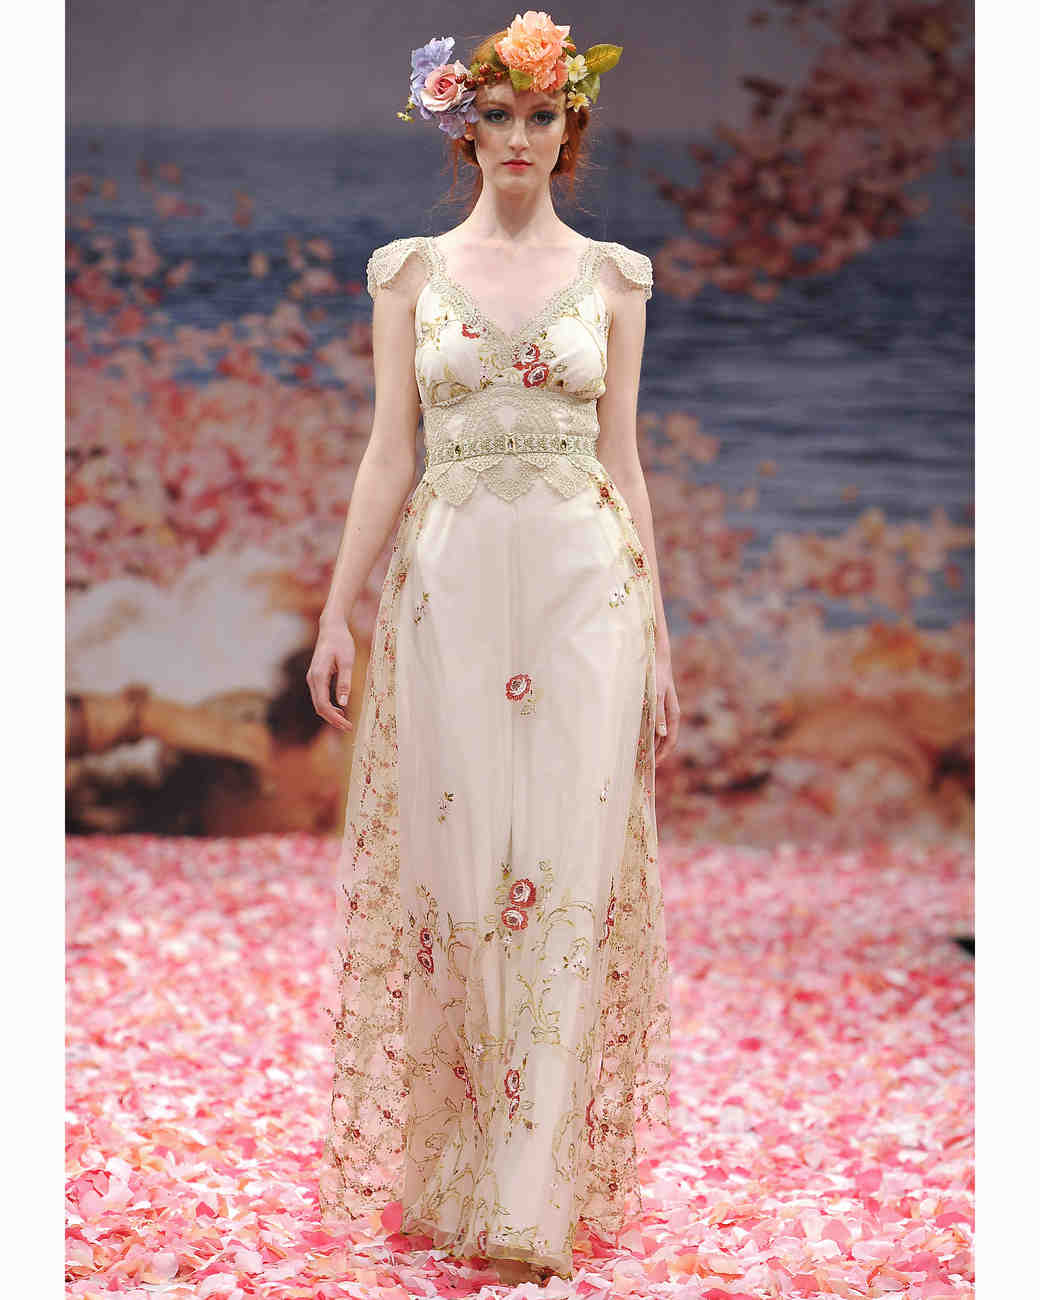 Wedding Dresses With Floral Embellishments, Fall 2013 | Martha ...